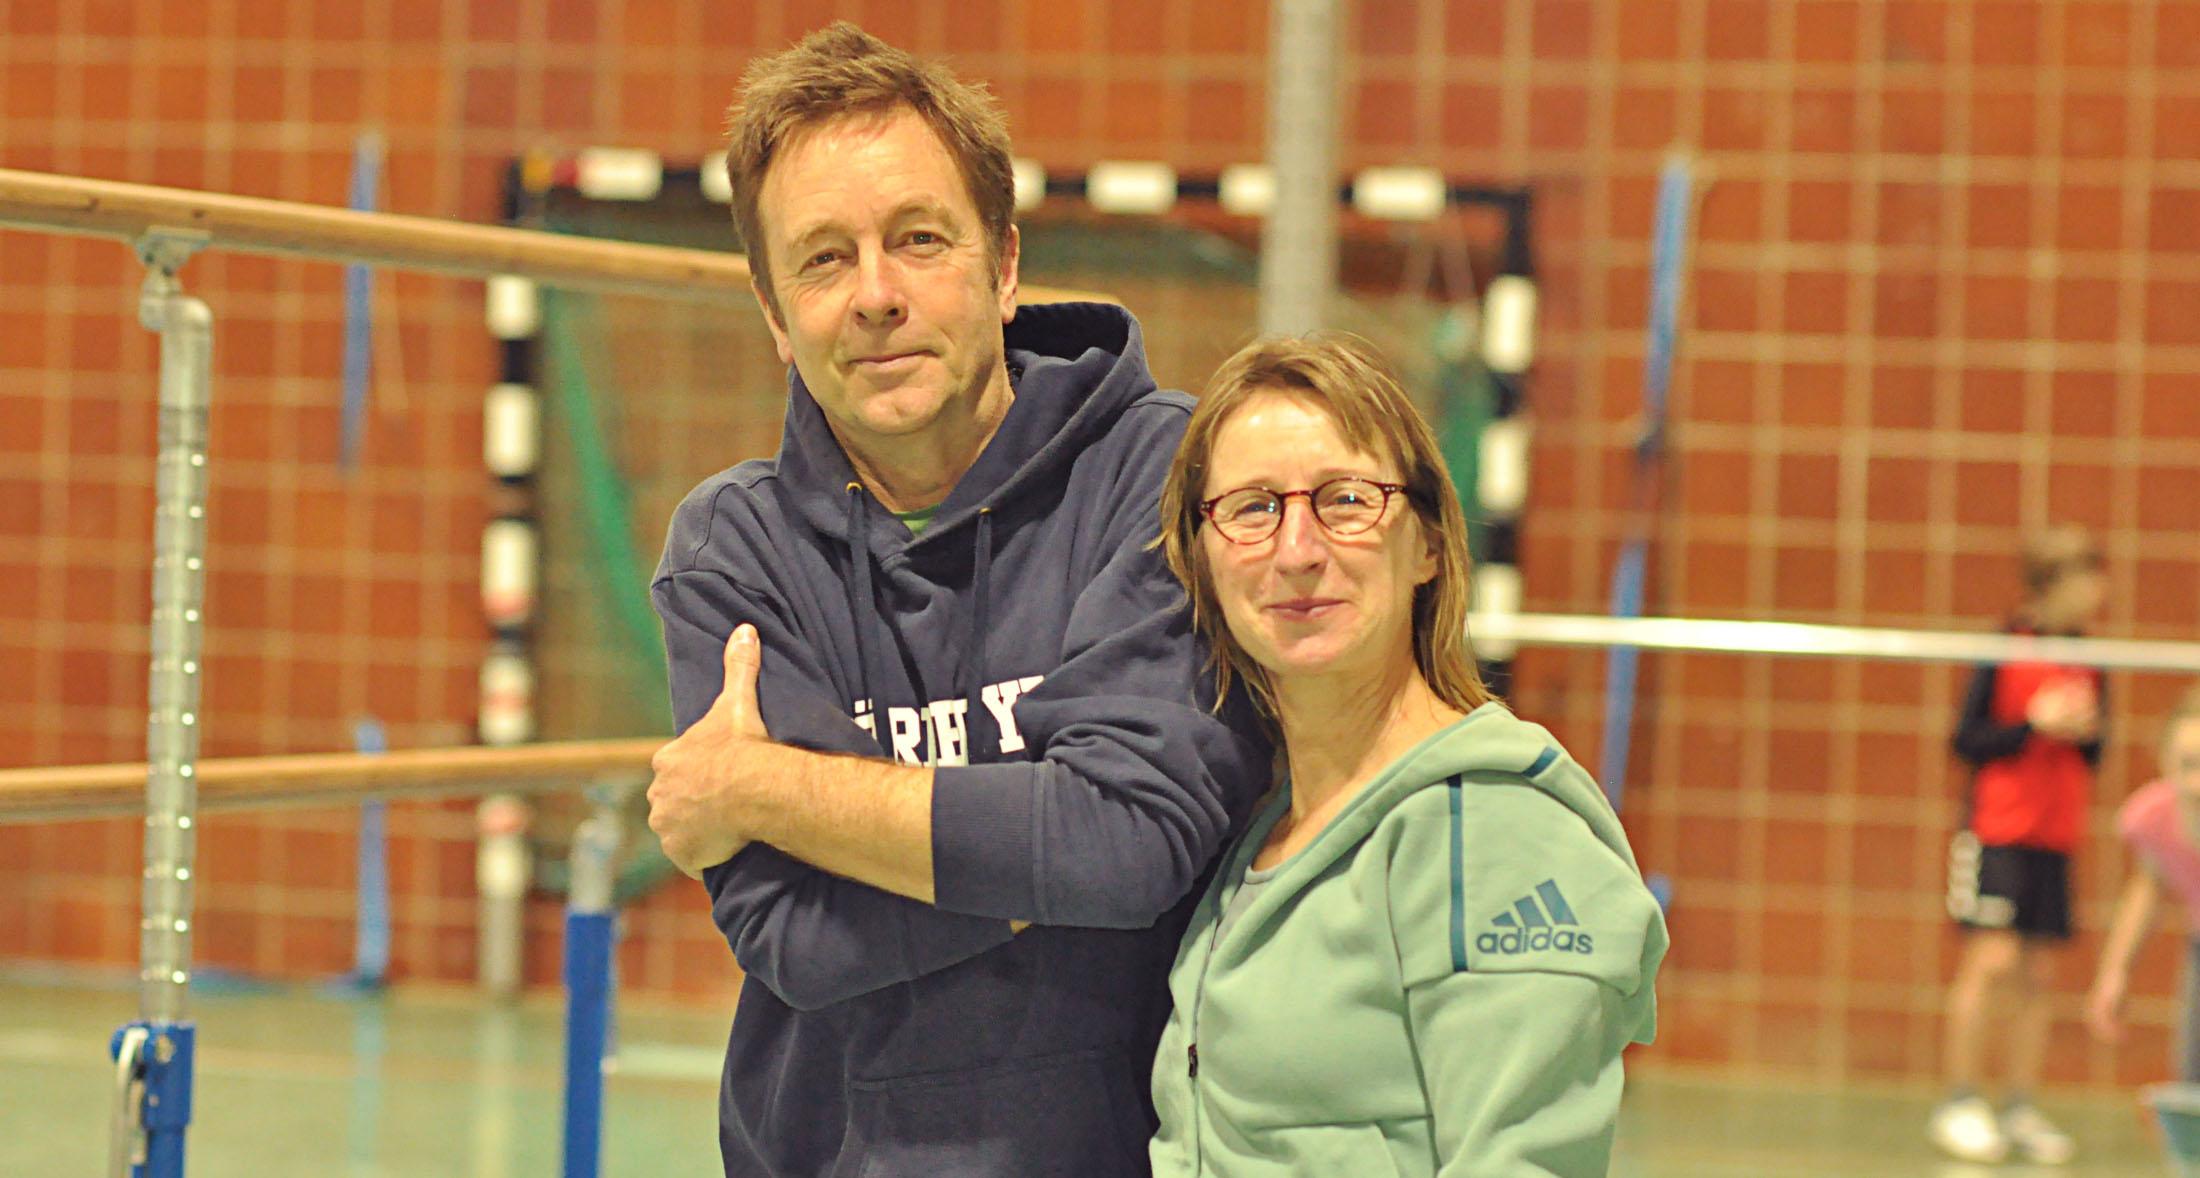 Frau Lack und Herr Henke